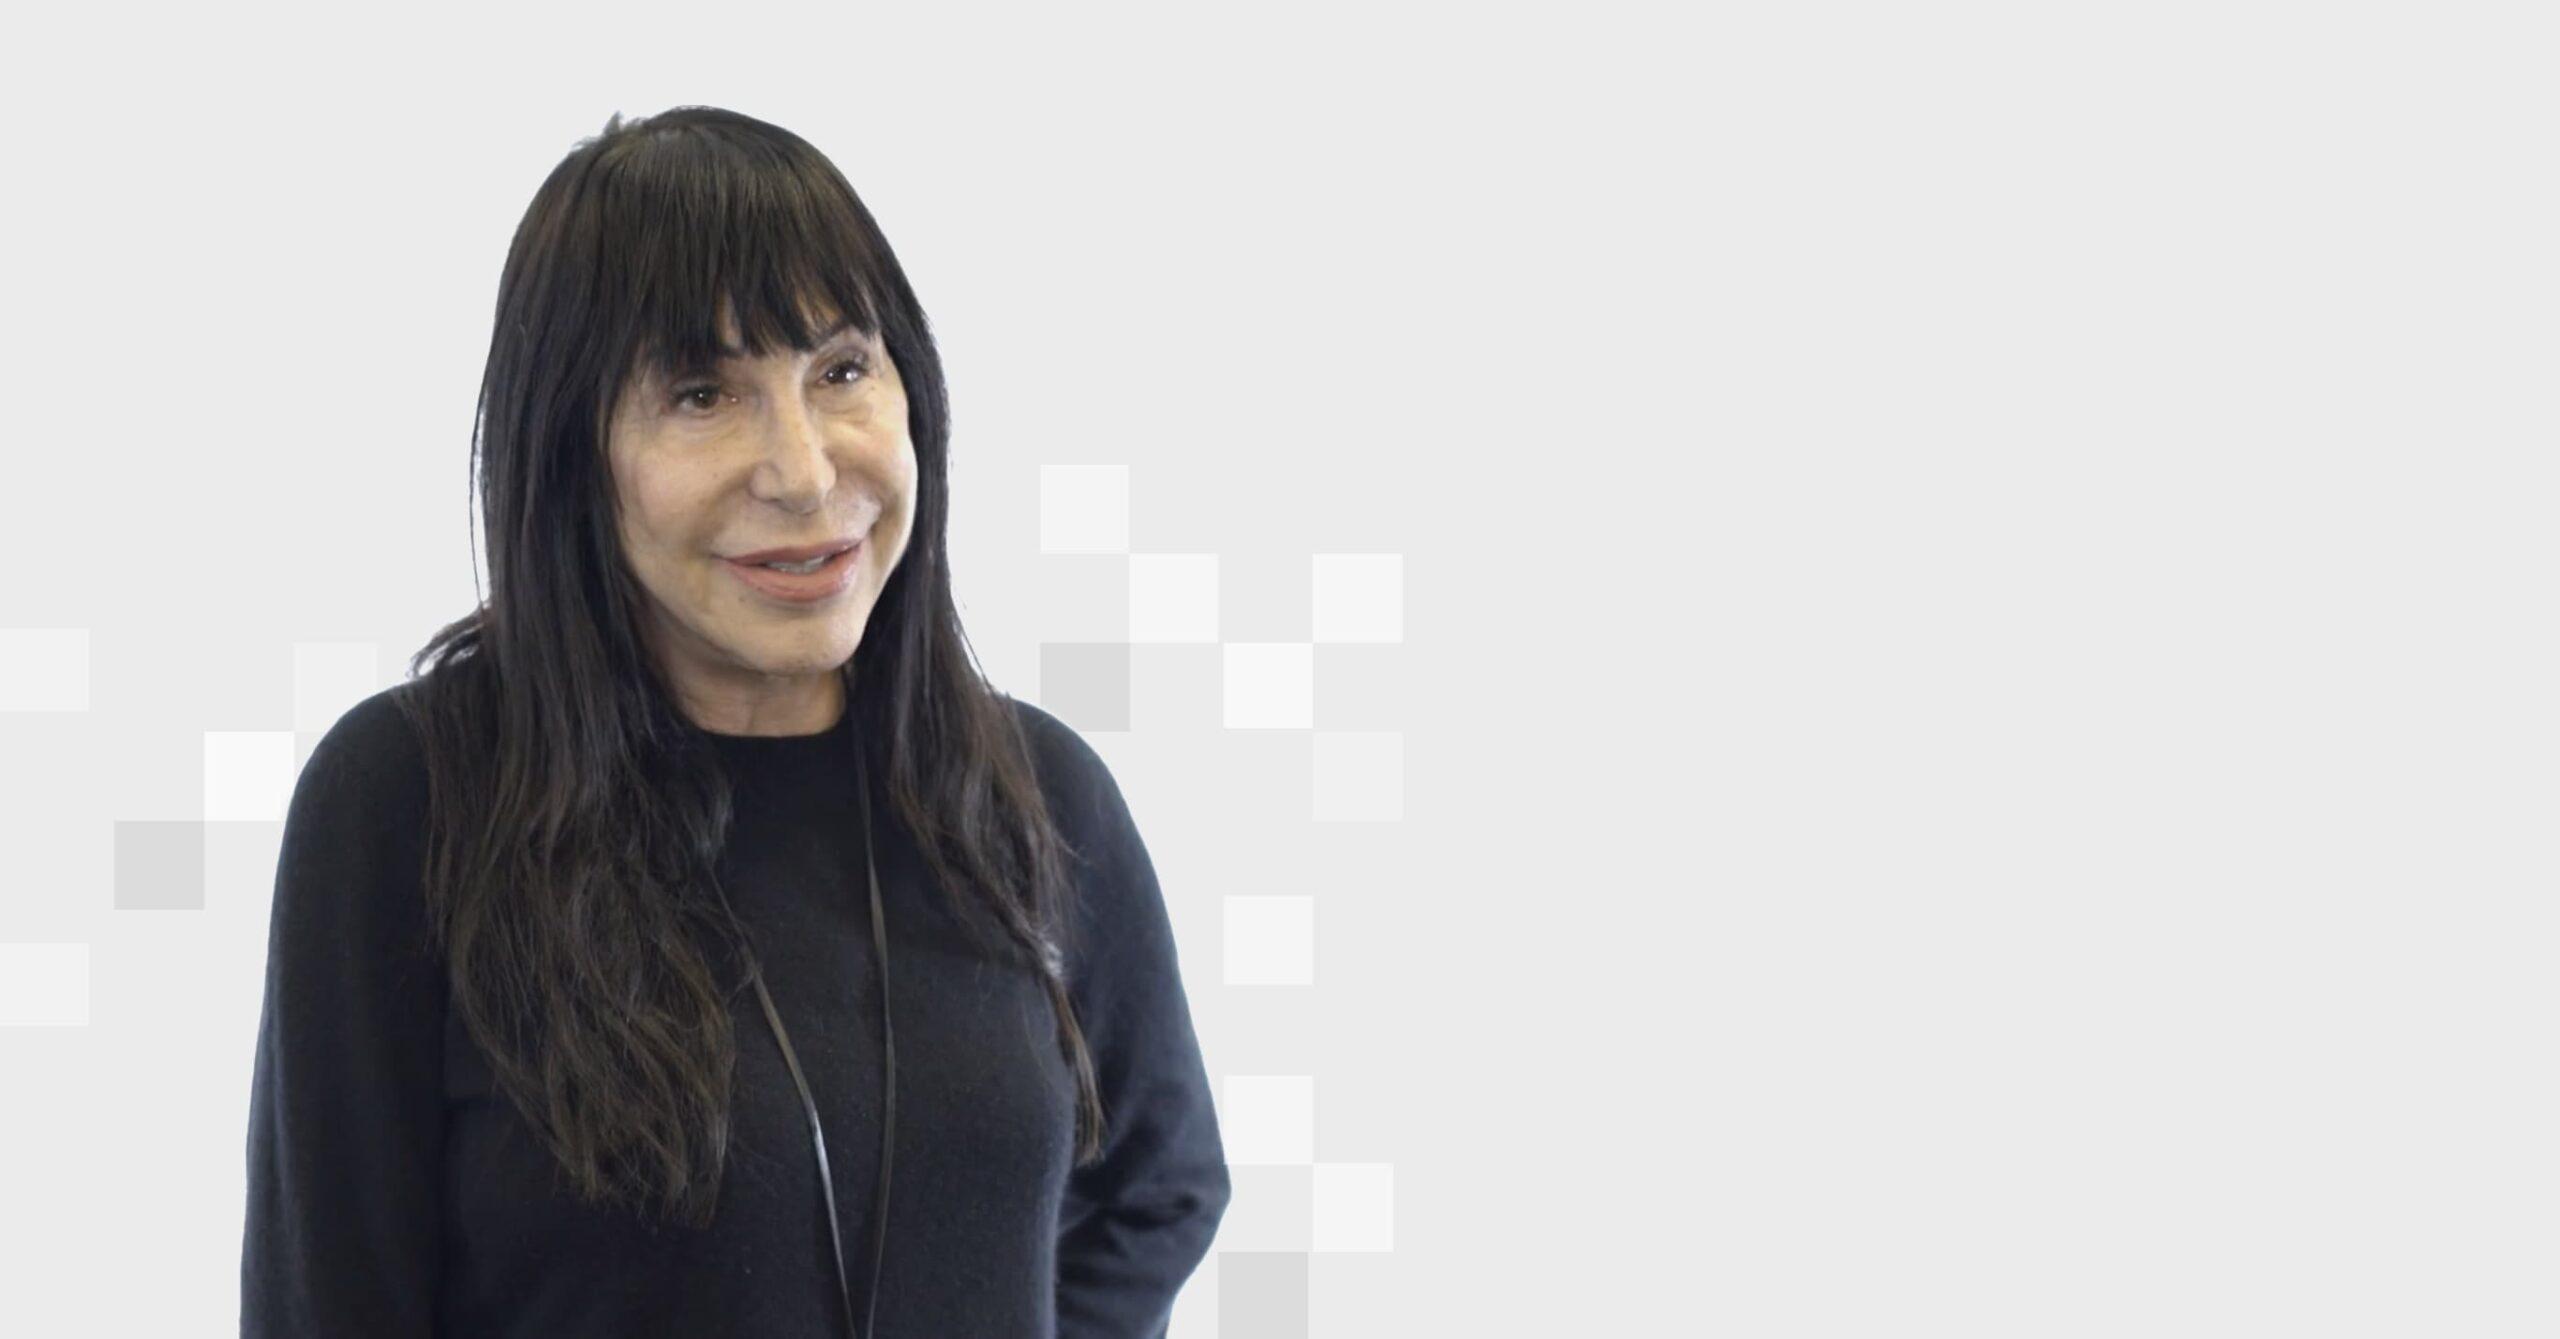 Ava Kaufmann, Heart transplant recipient